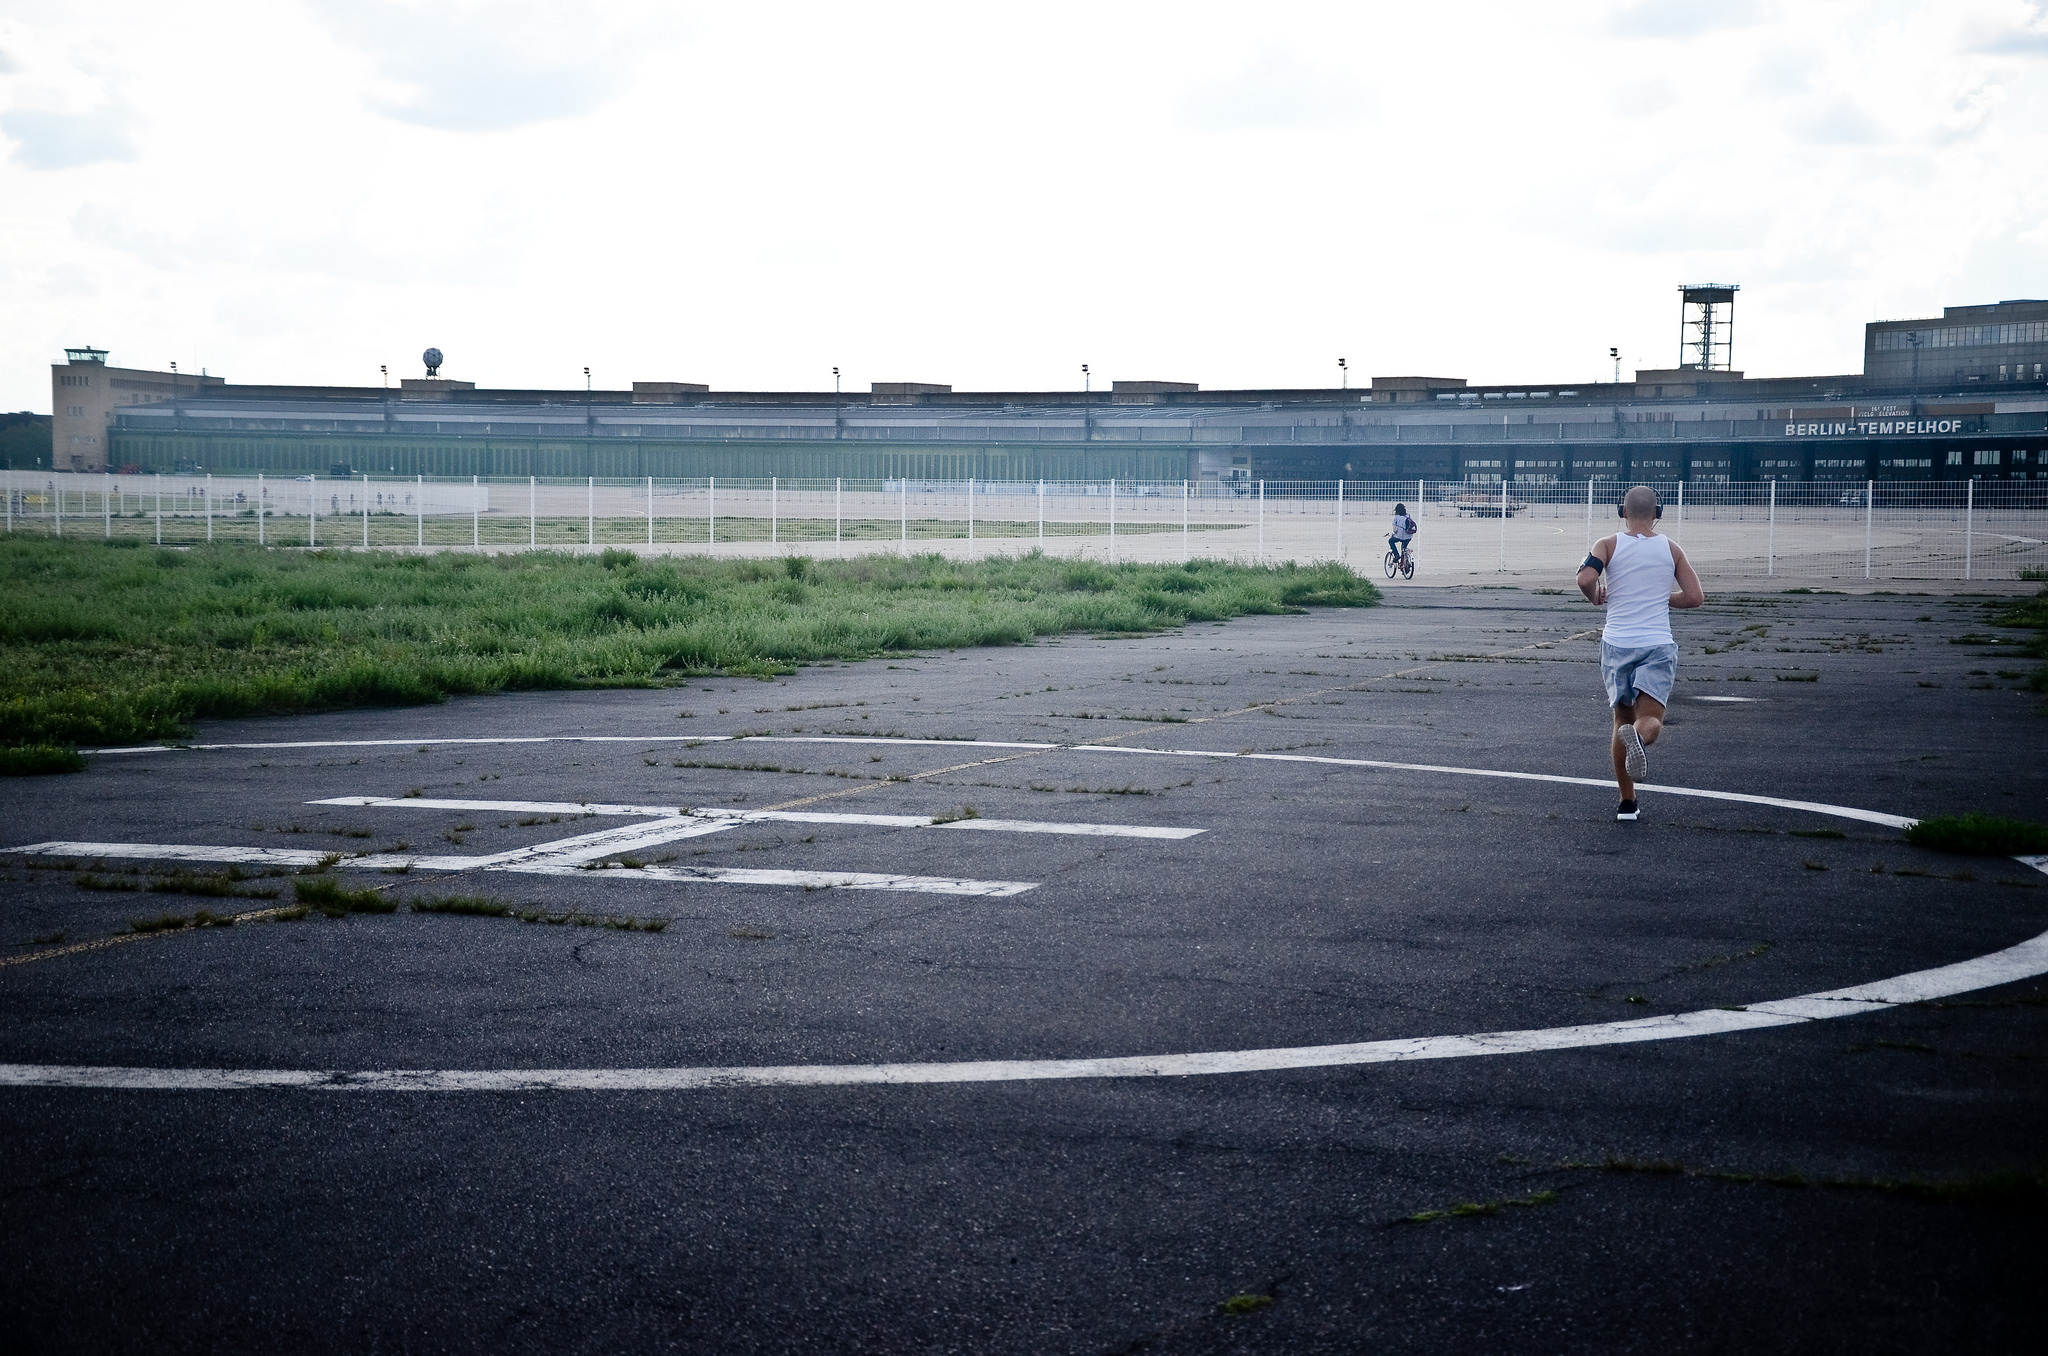 Un weekend da ricordare – Parte terza: Tempelhofer Feld